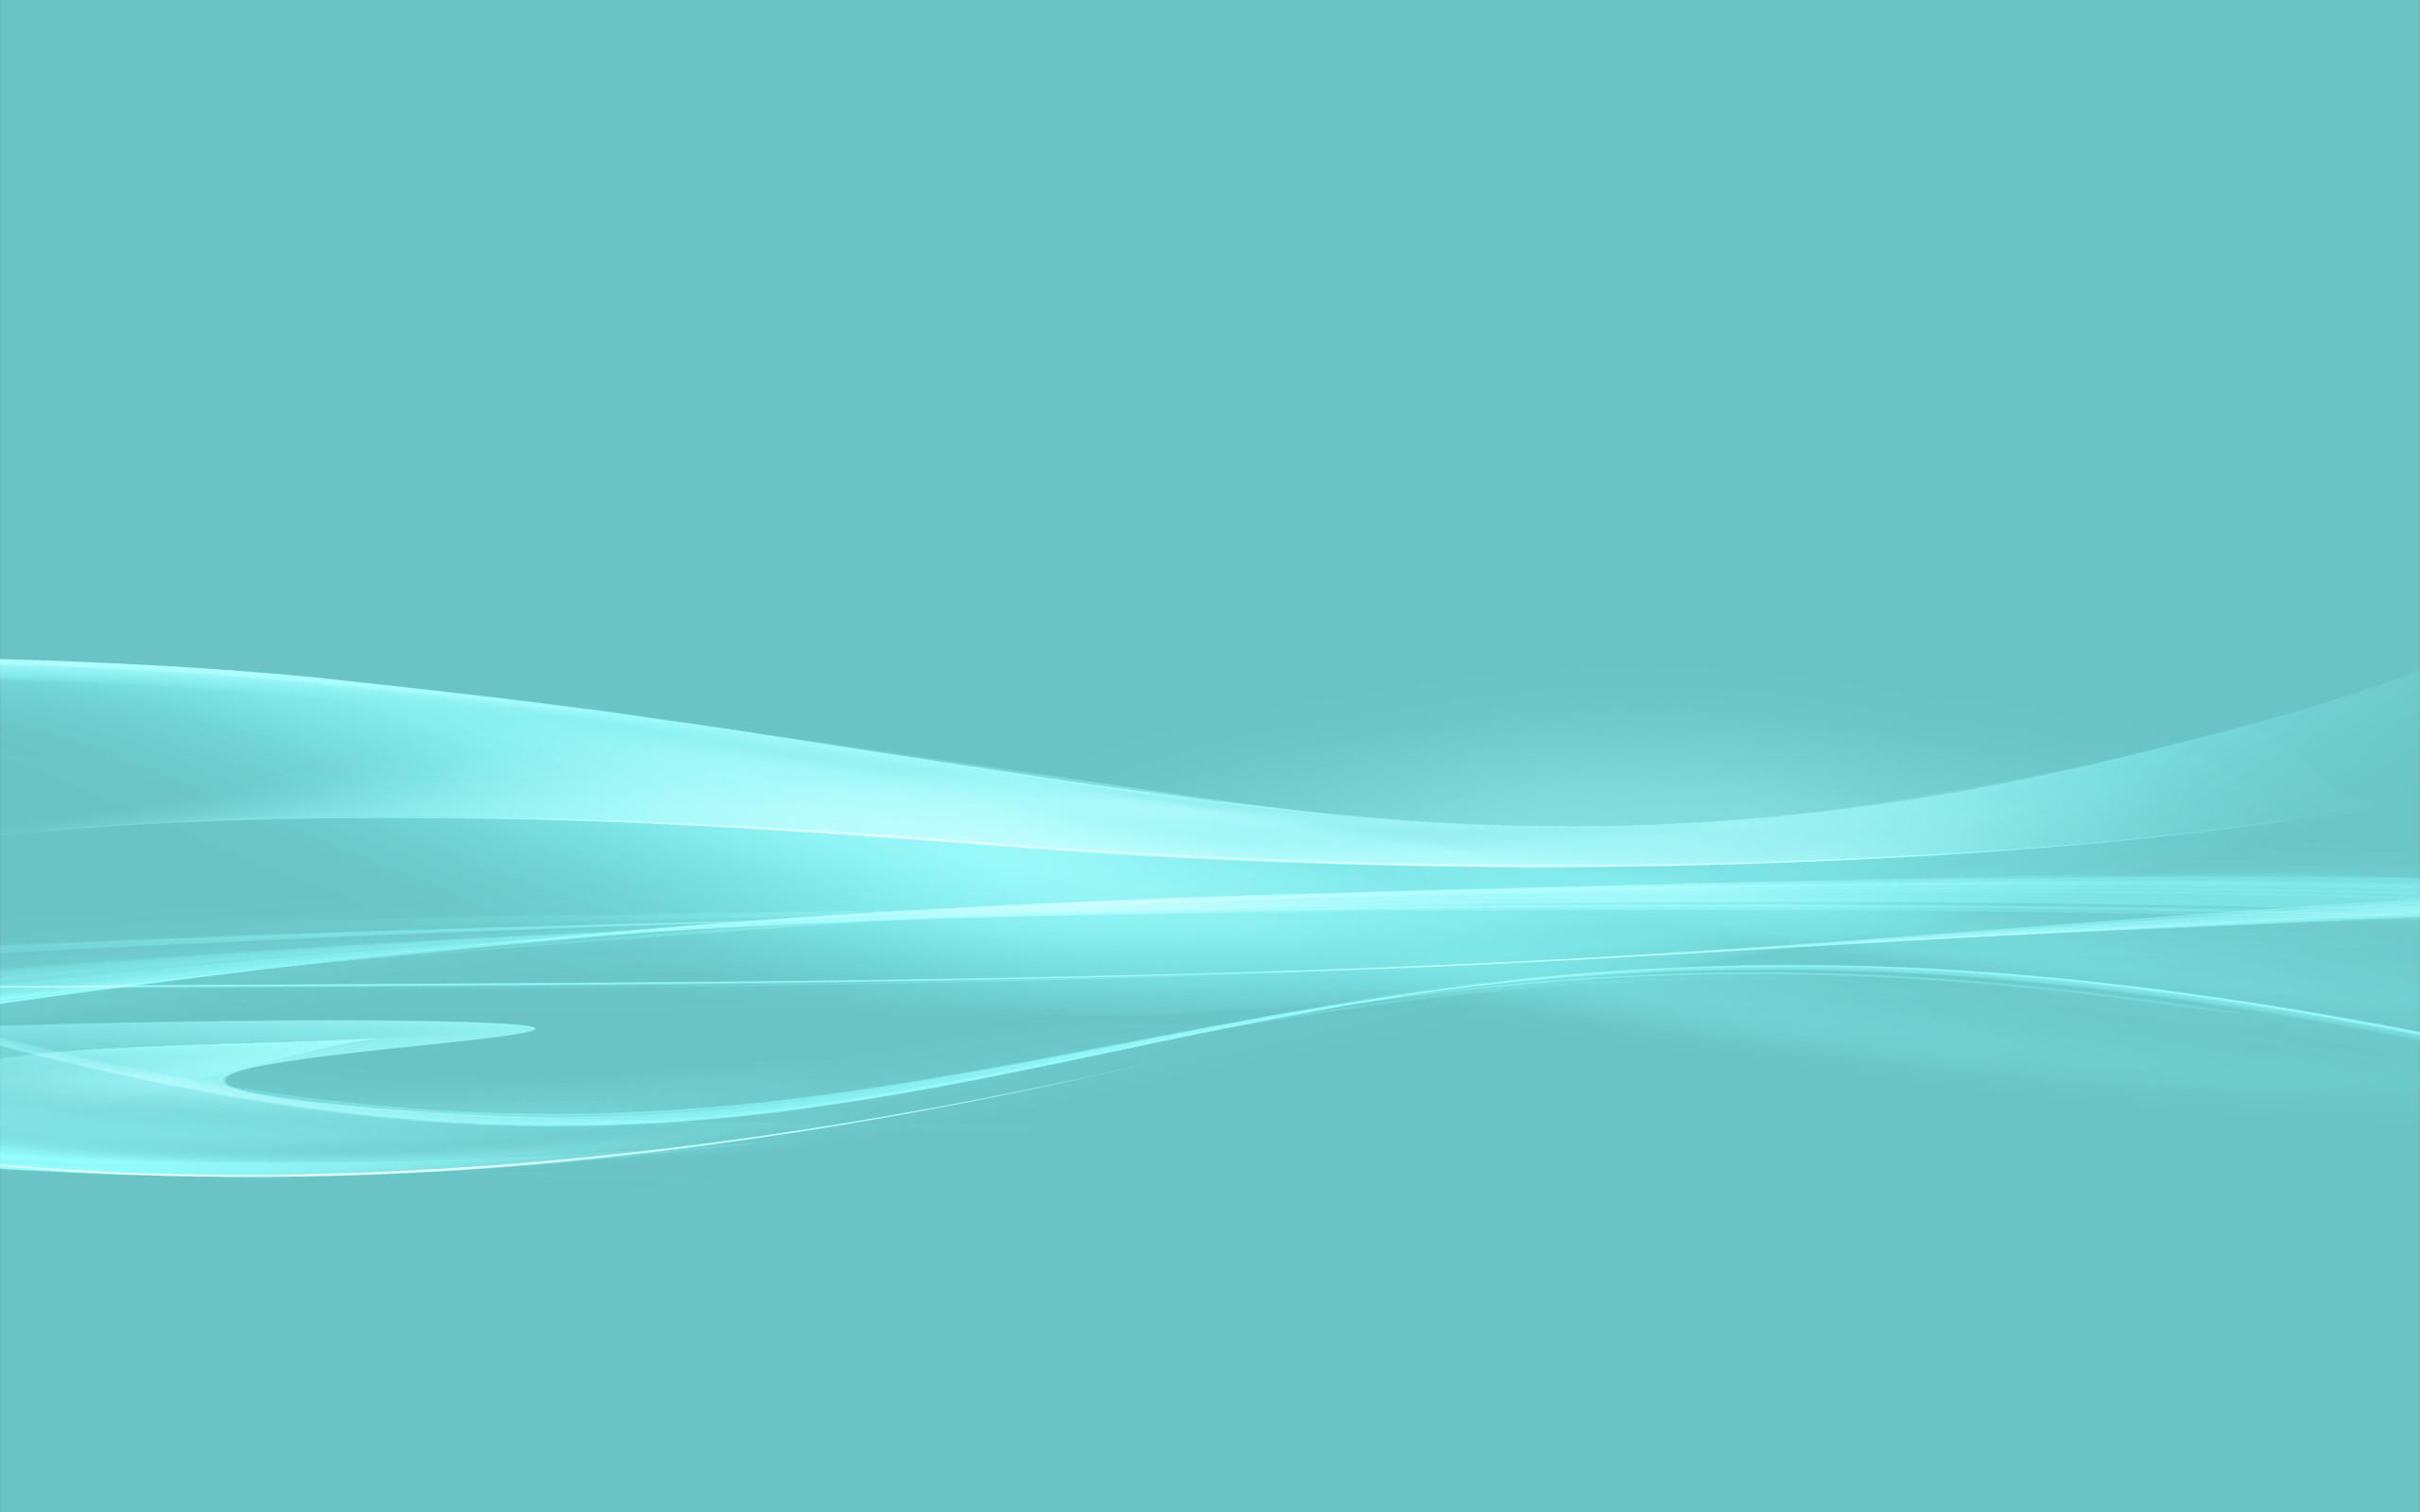 Solid-light-blue-wide-wallpaper